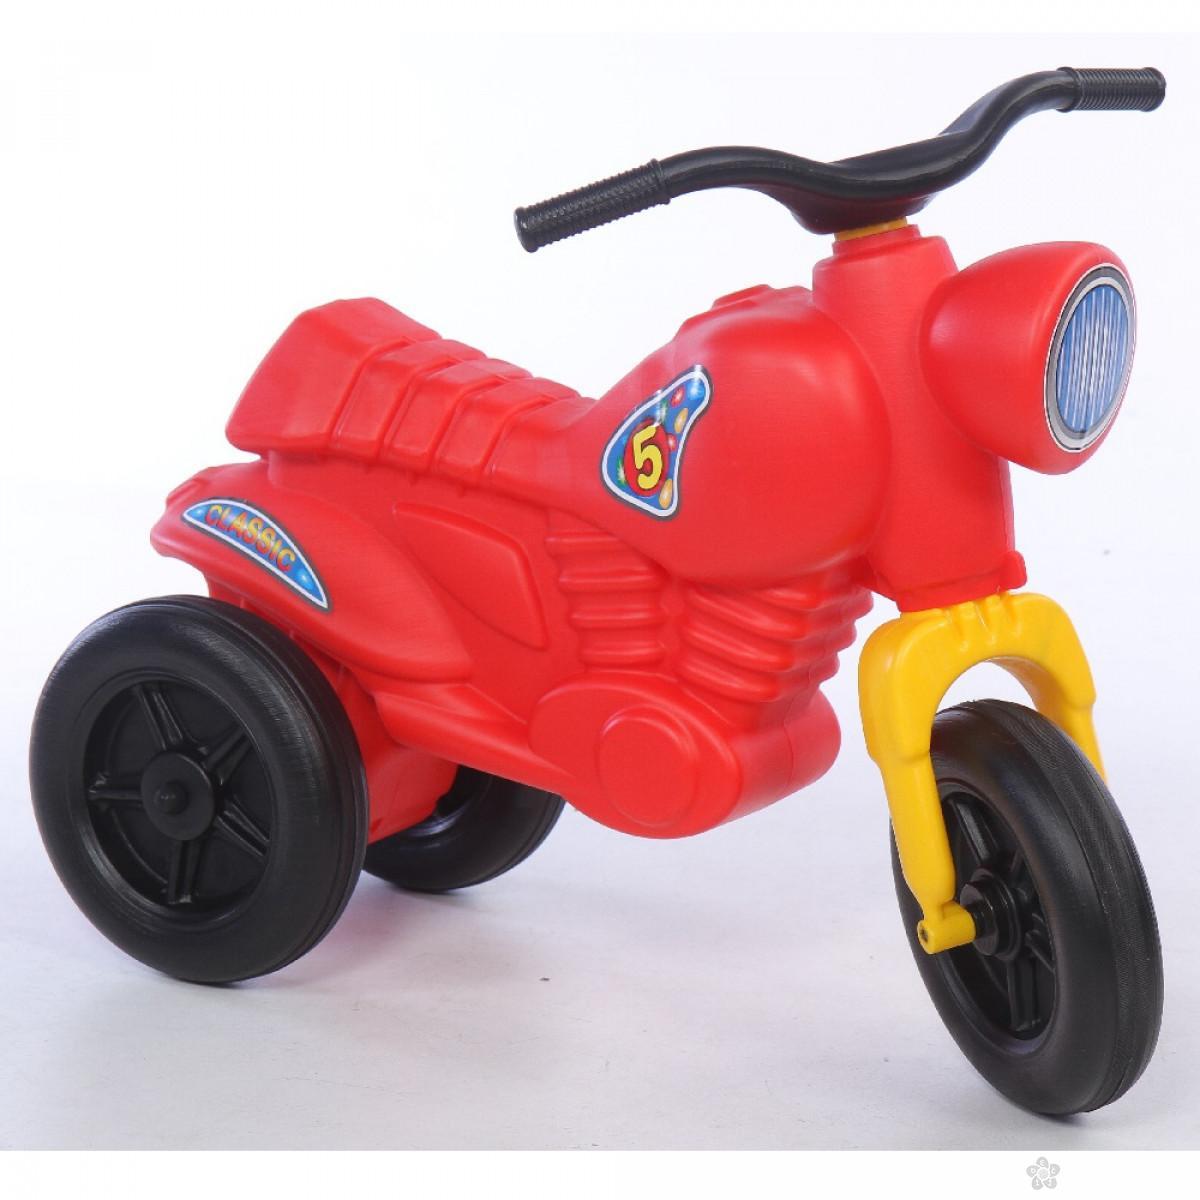 Dečija guralica Classics 5 Maxi Motor Bike crvena, 540154